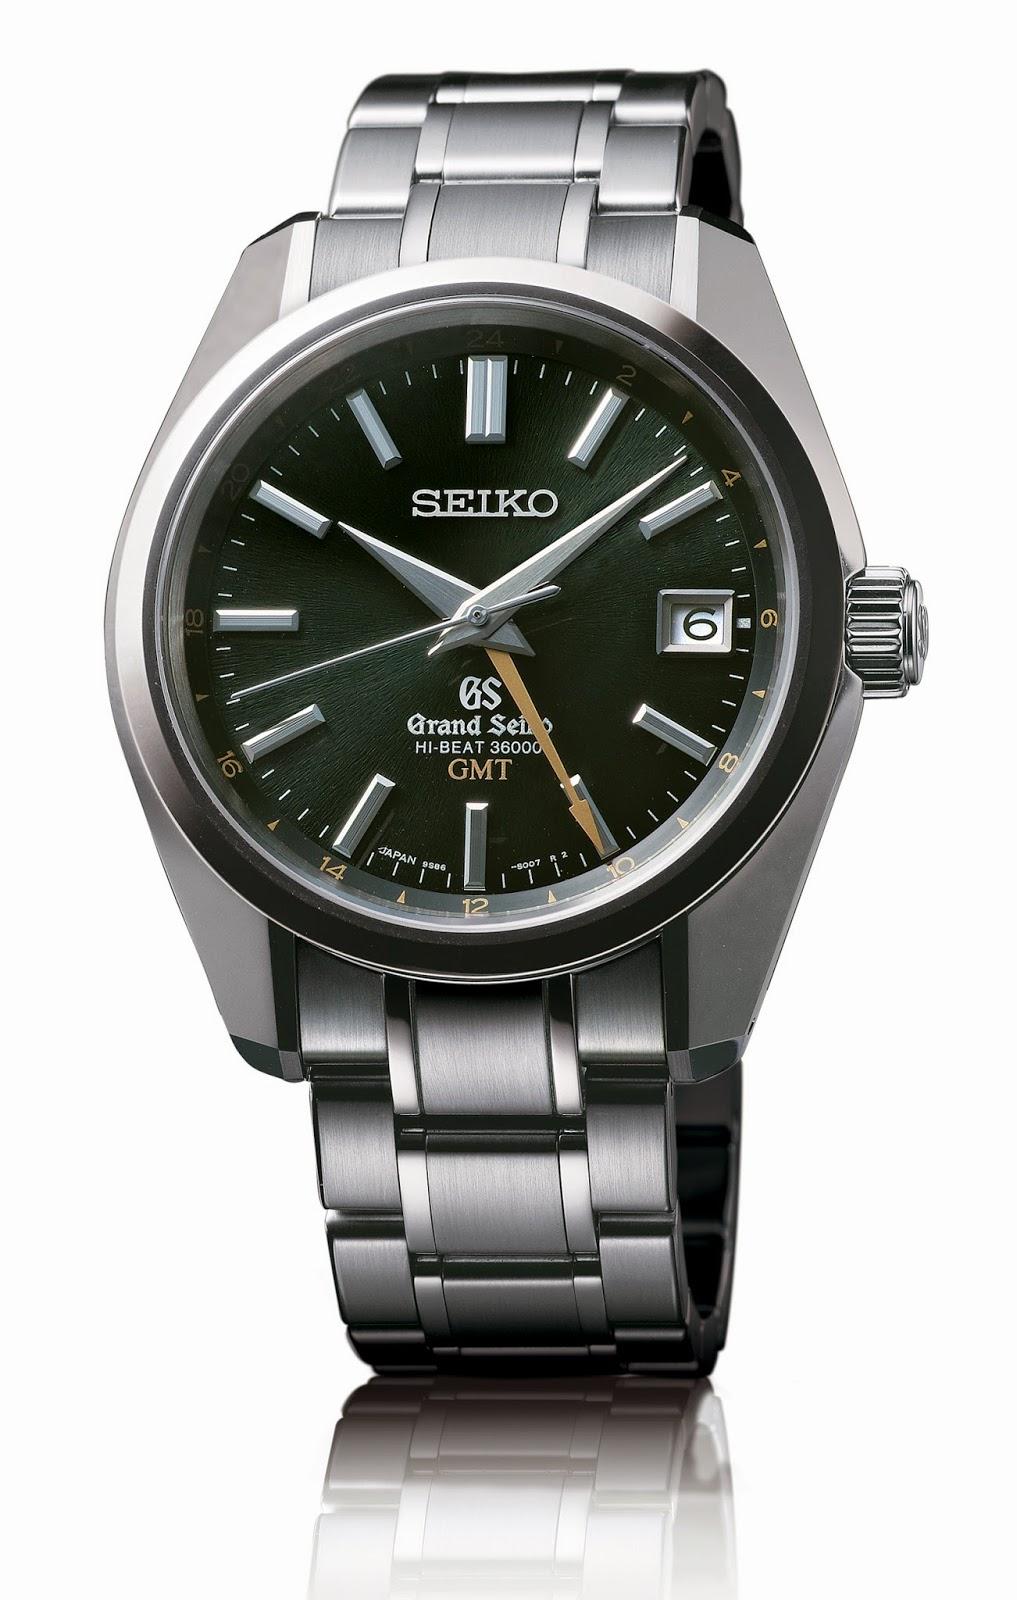 Seiko, Grand Seiko Hi-Beat 36000 GMT